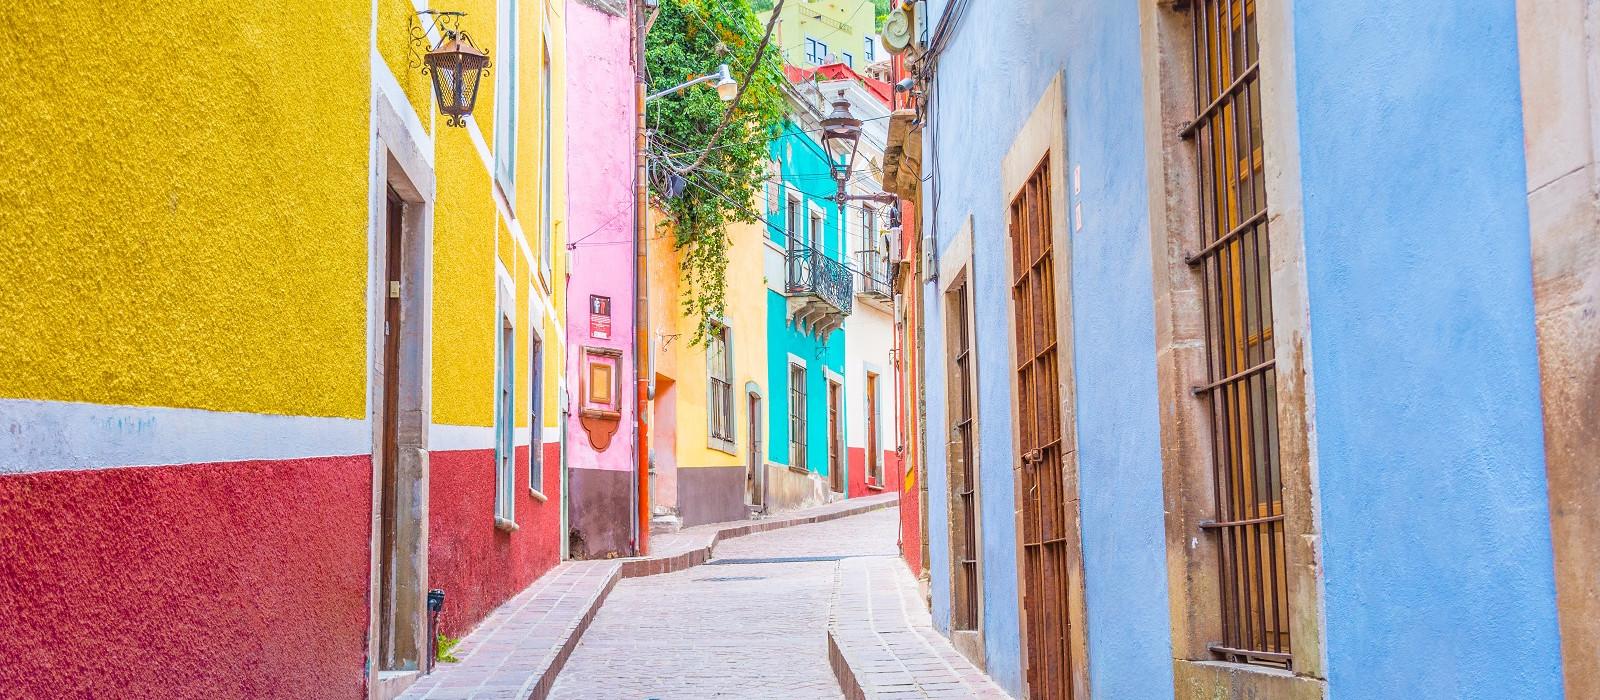 Große Tour durch Mexiko Urlaub 1